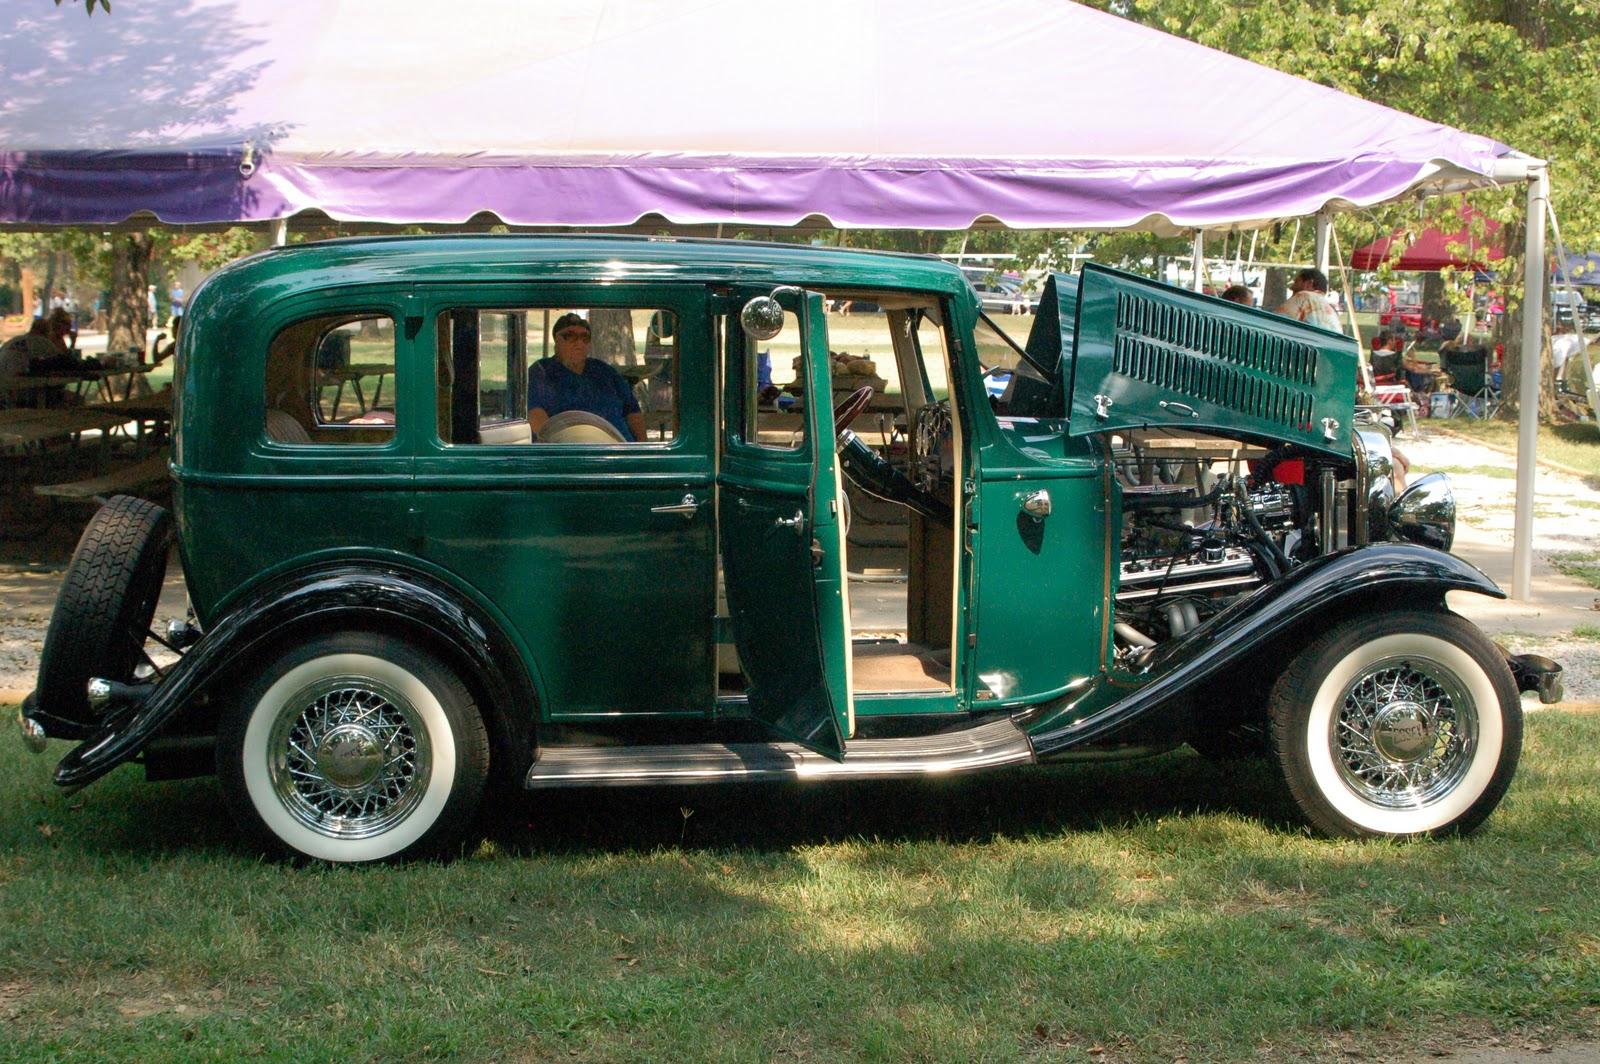 Turnerbudds Car Blog: A Low Cost, Dependable Sedan